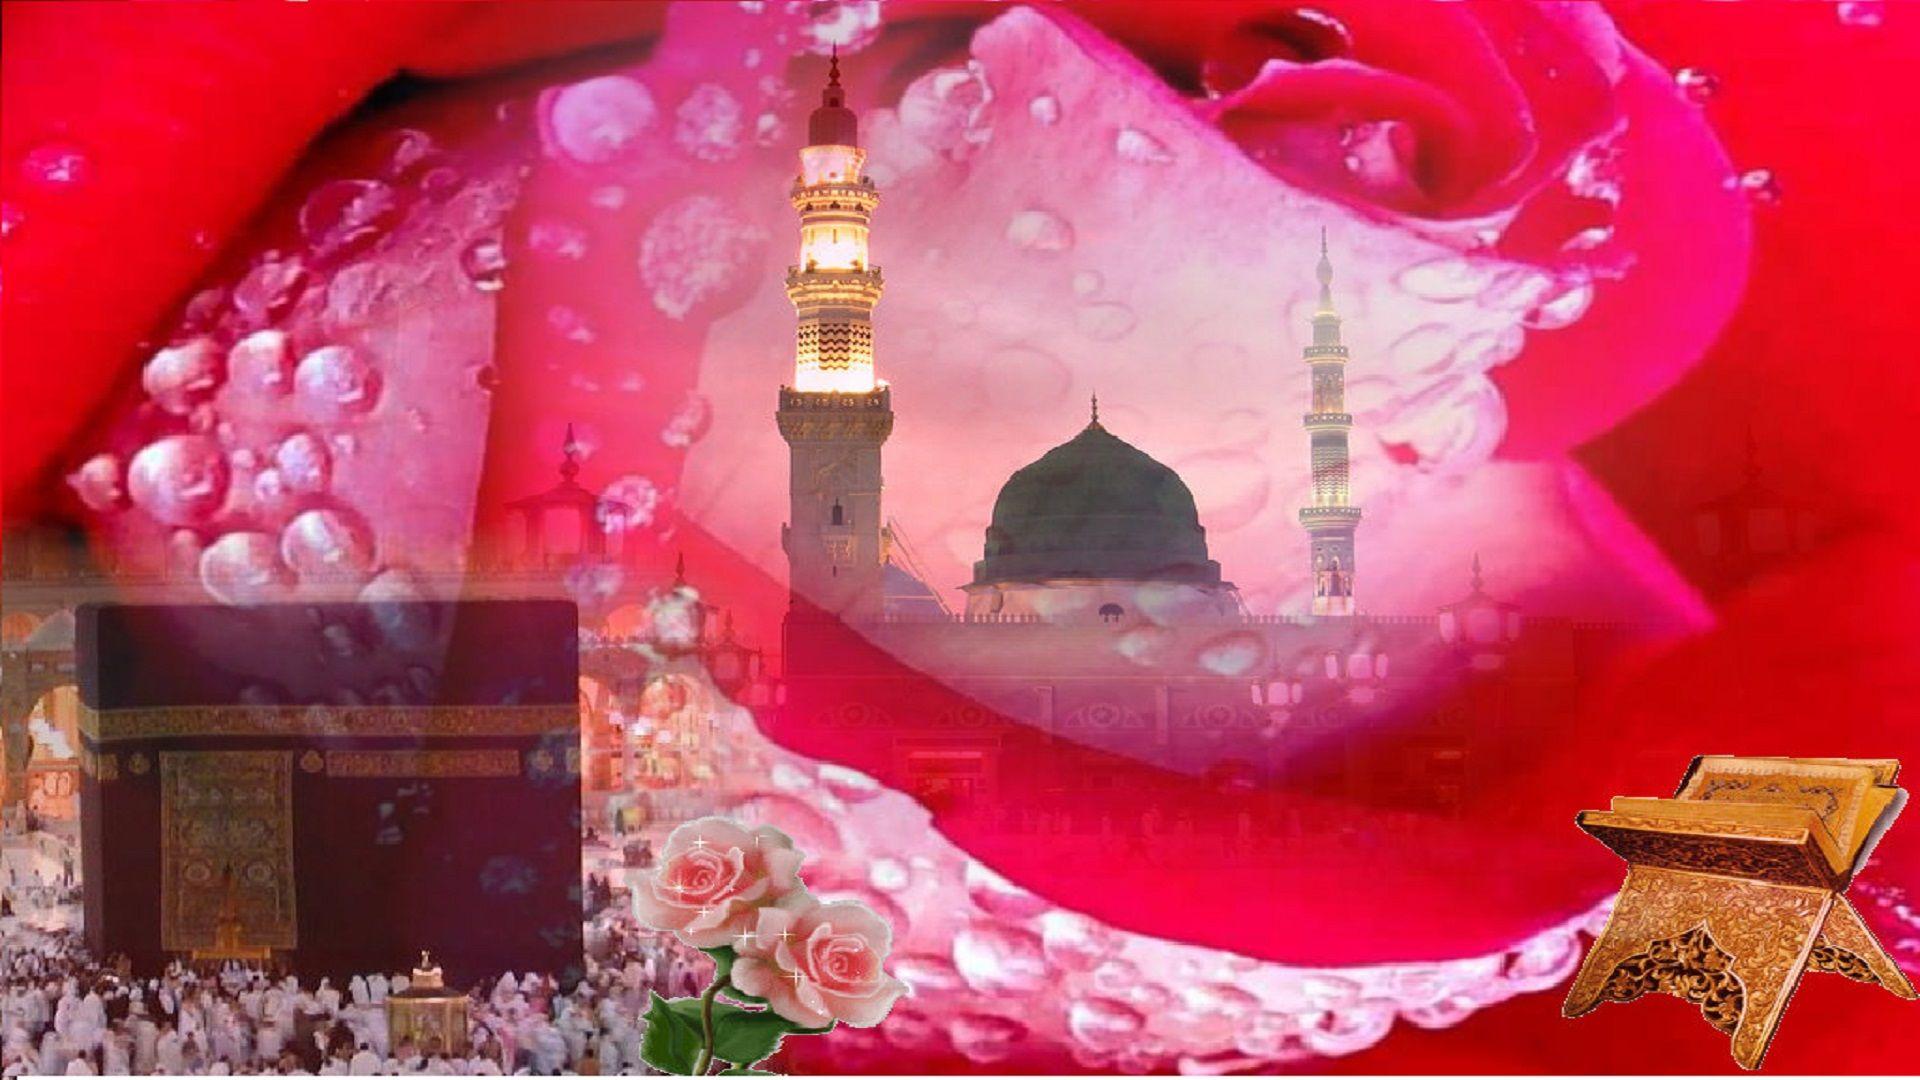 Madina Shareef Wallapapers With Makkah So Beautiful Hd Free Hd Wallpaper Makkah Madina